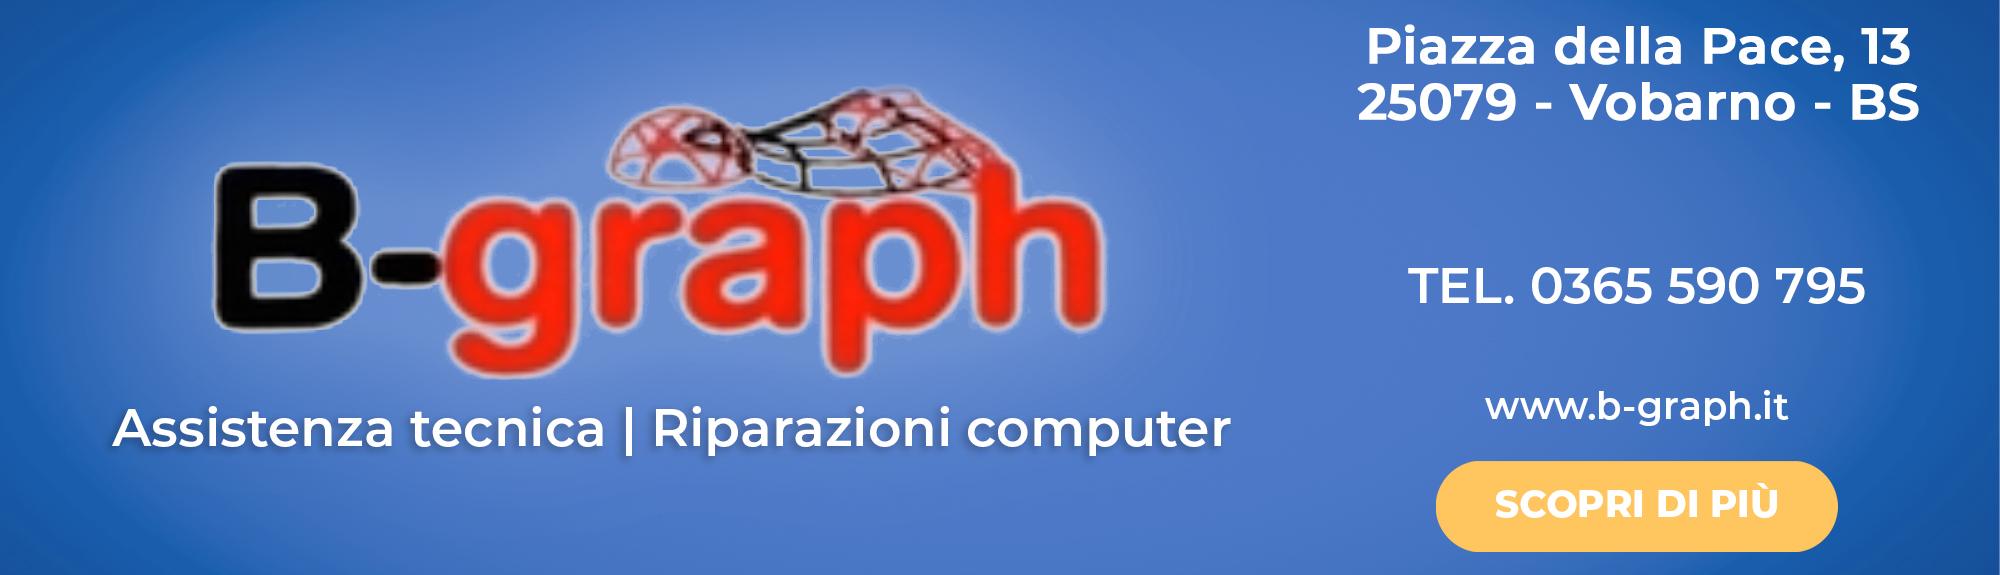 B-GRAPH